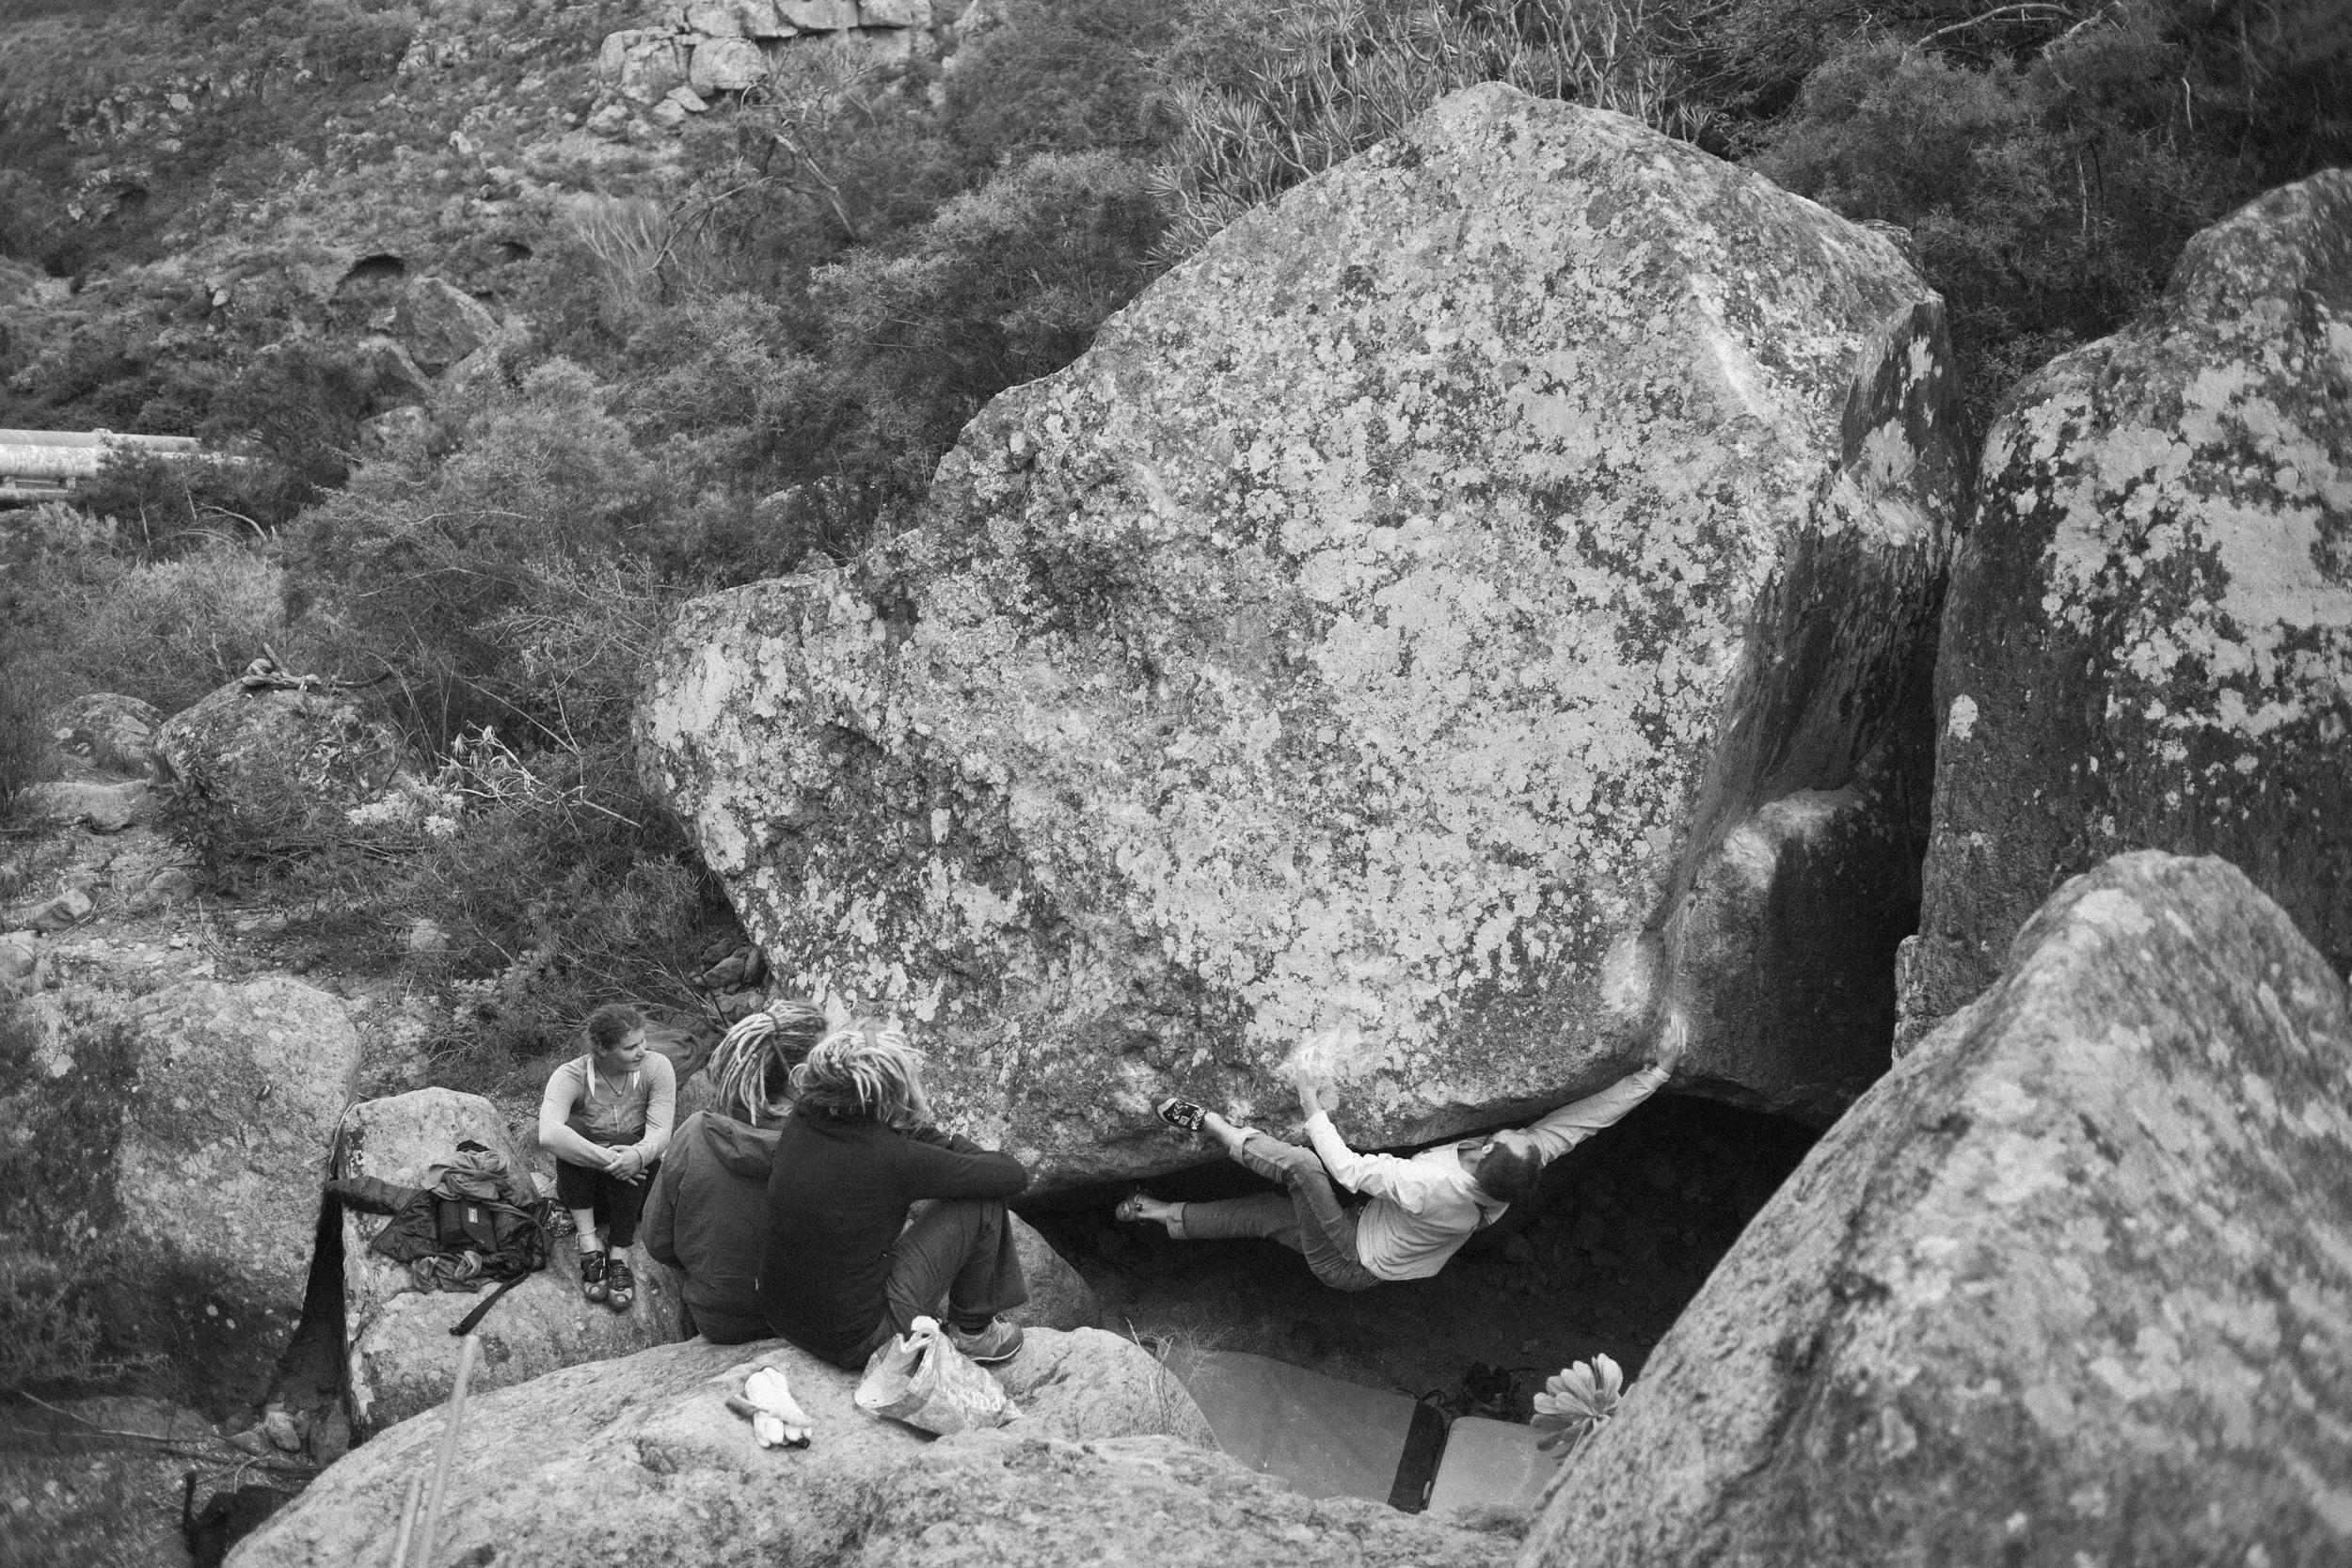 climbing-1.jpg